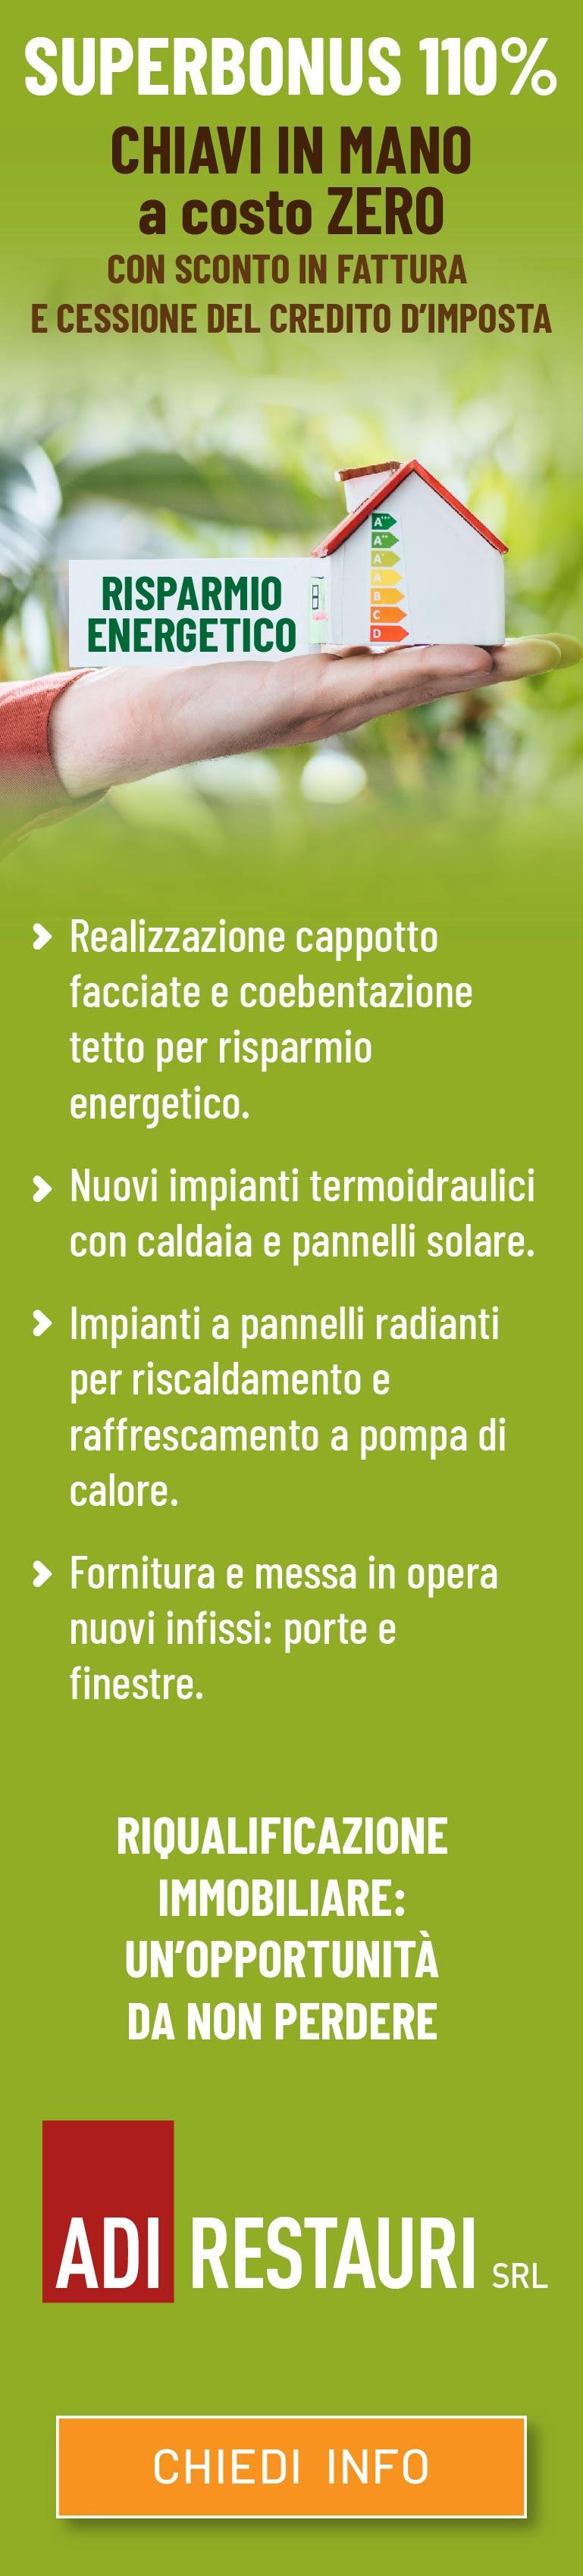 SuperBonus 110% Firenze - ADI RESTAURI srl